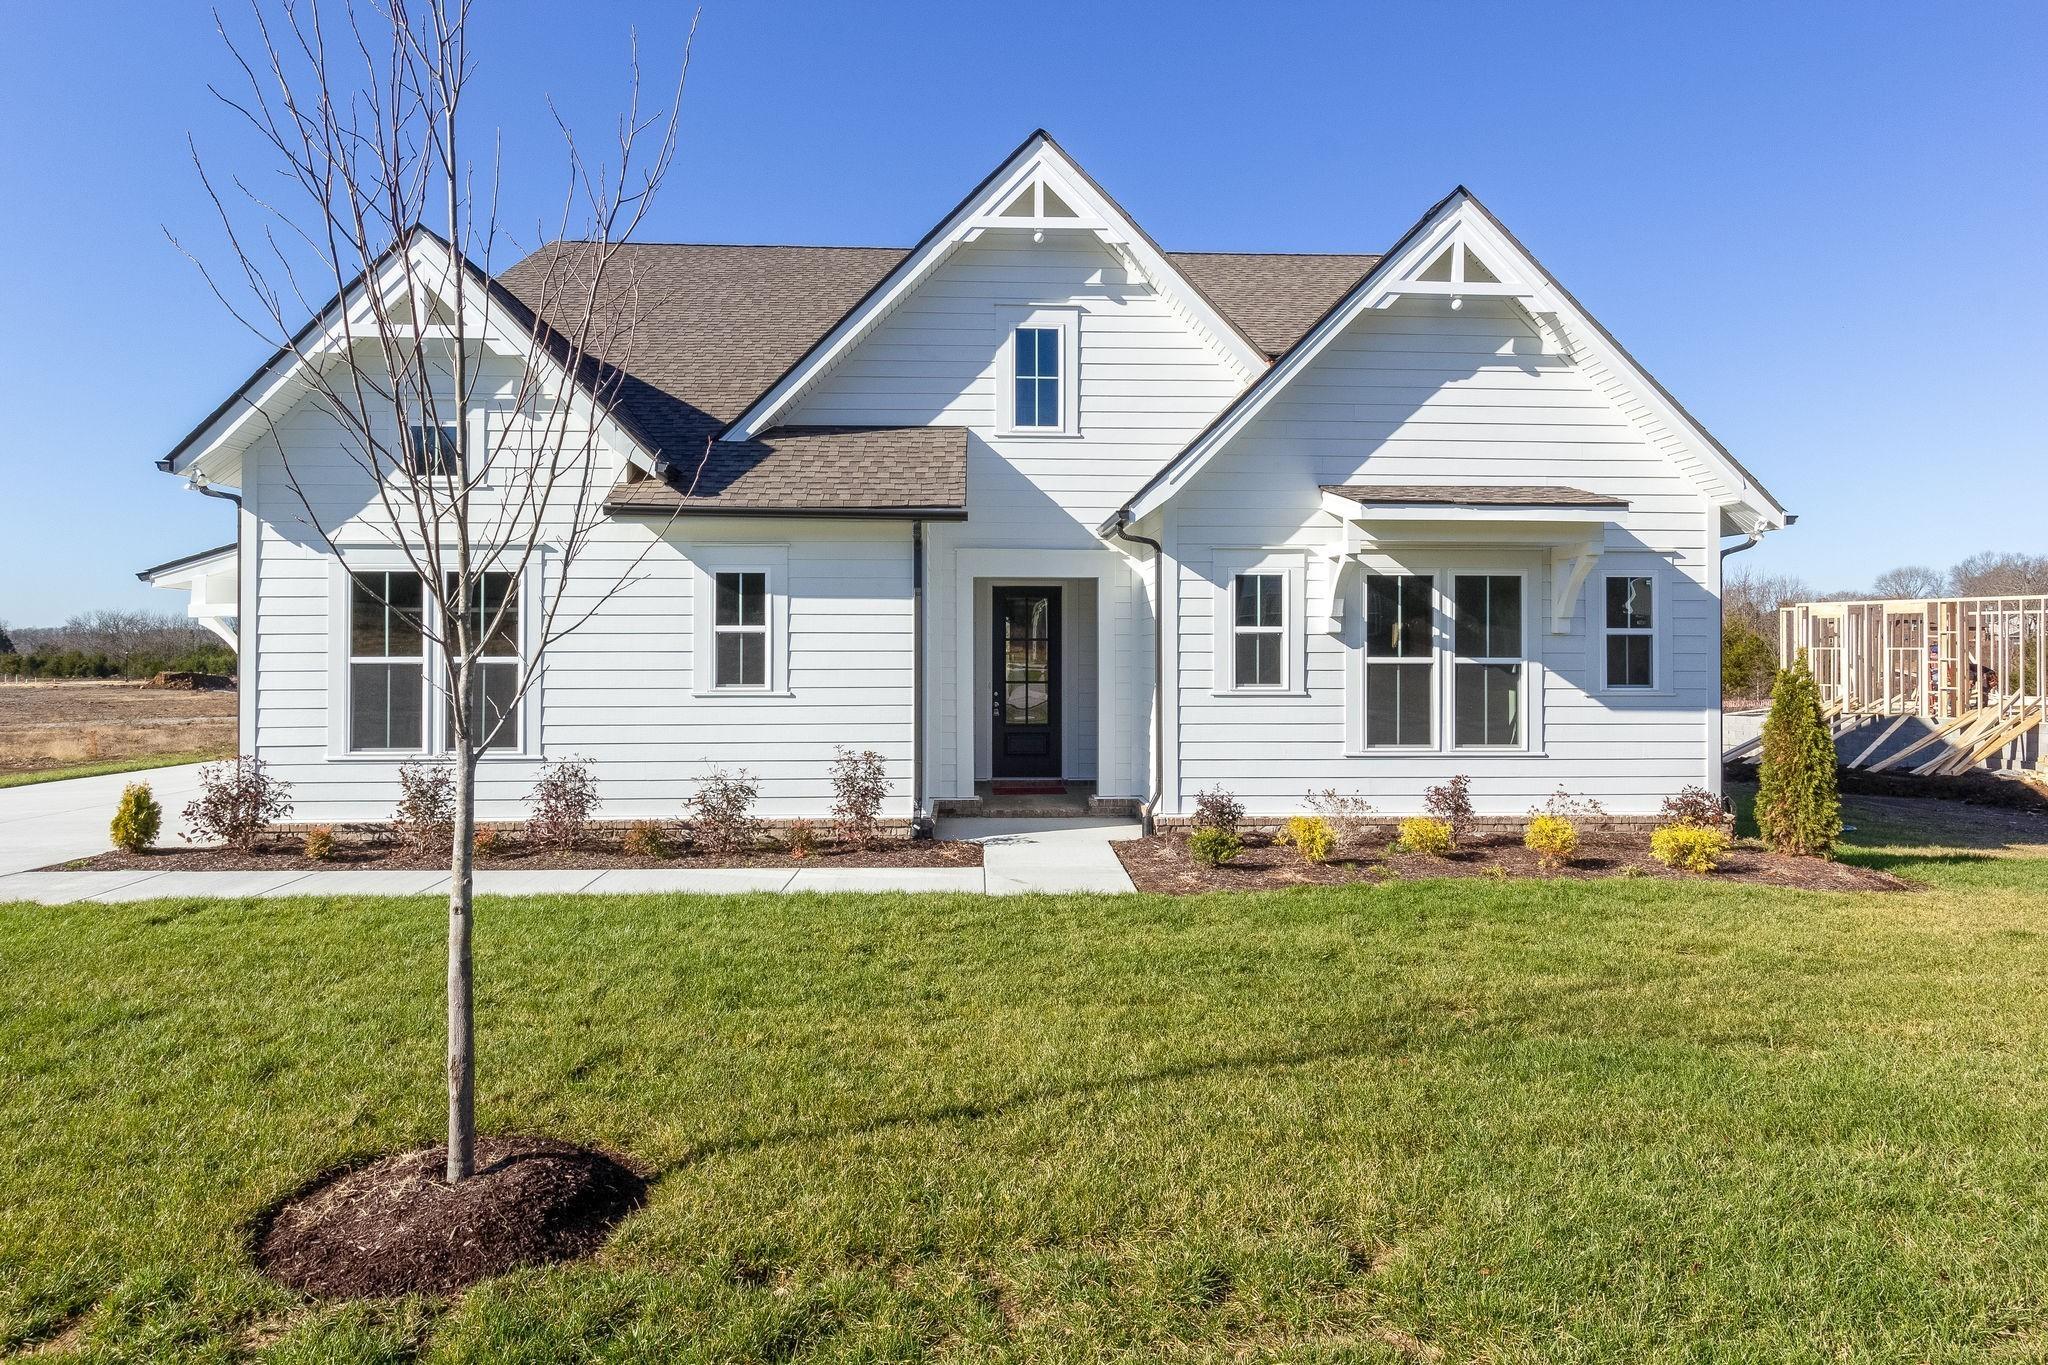 803 Overton Dr Lot 31 Property Photo 1